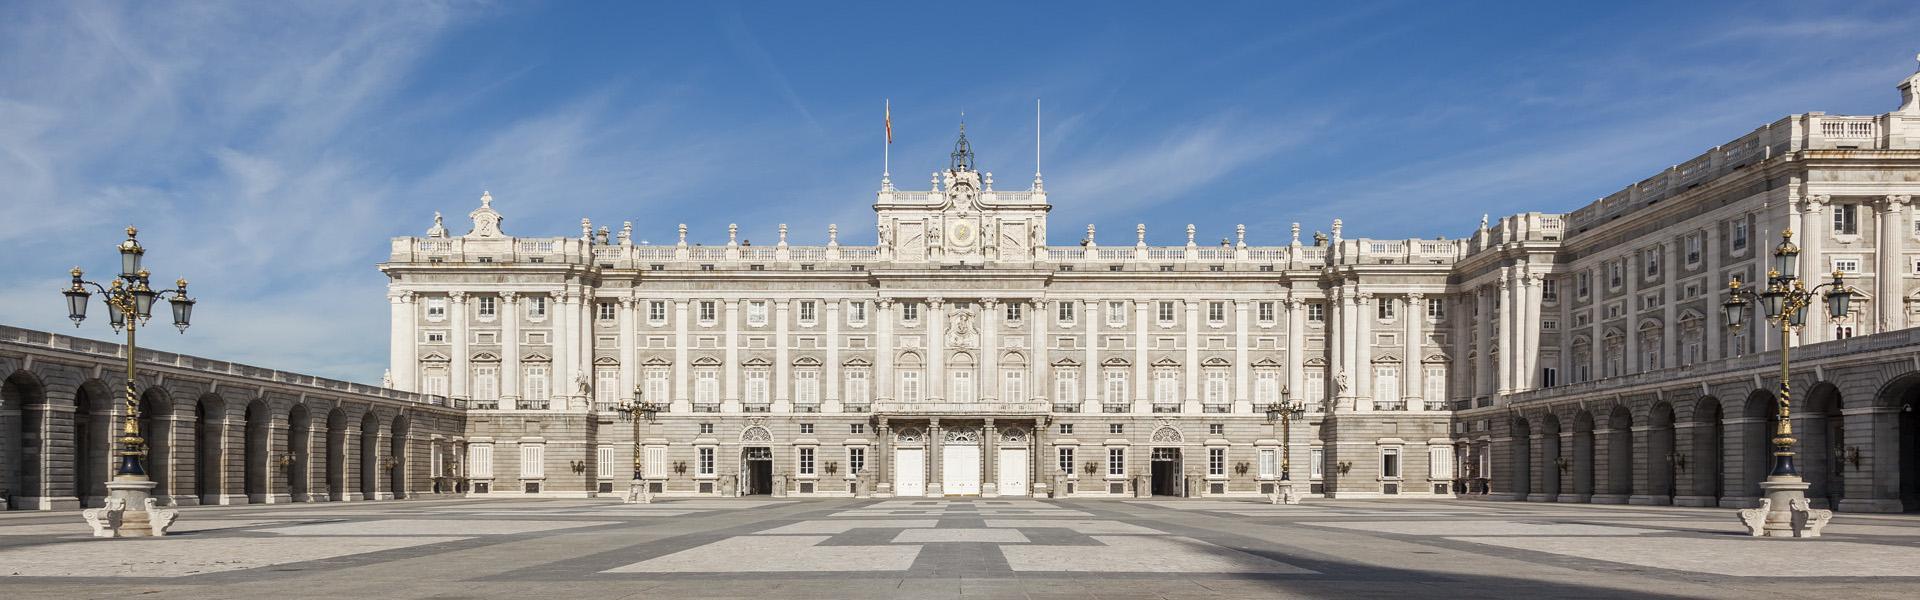 fachada palacio real